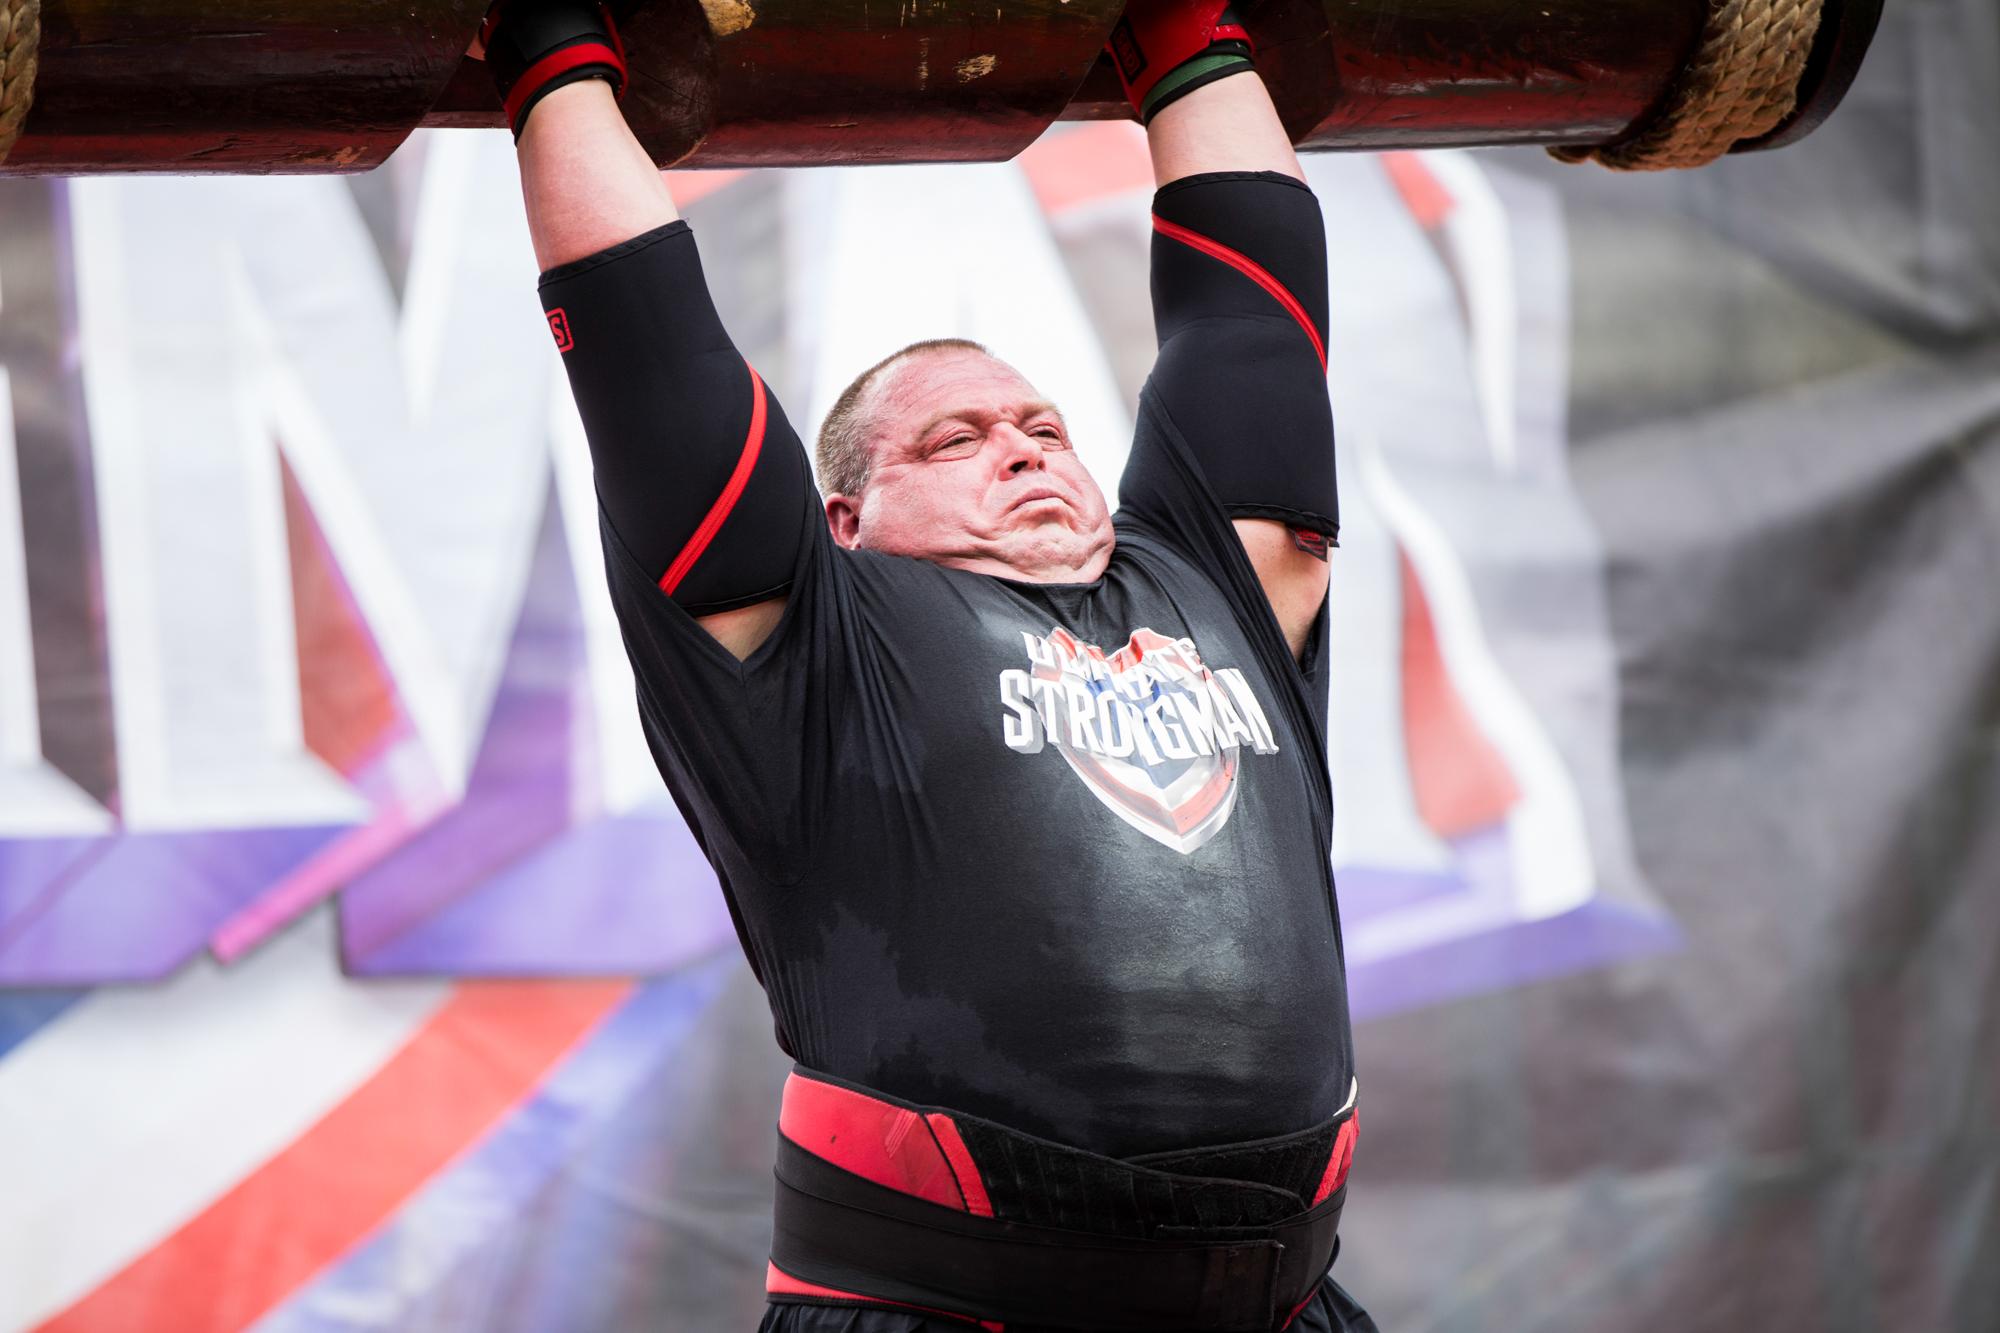 Ultimate Strongman Summermania 2017